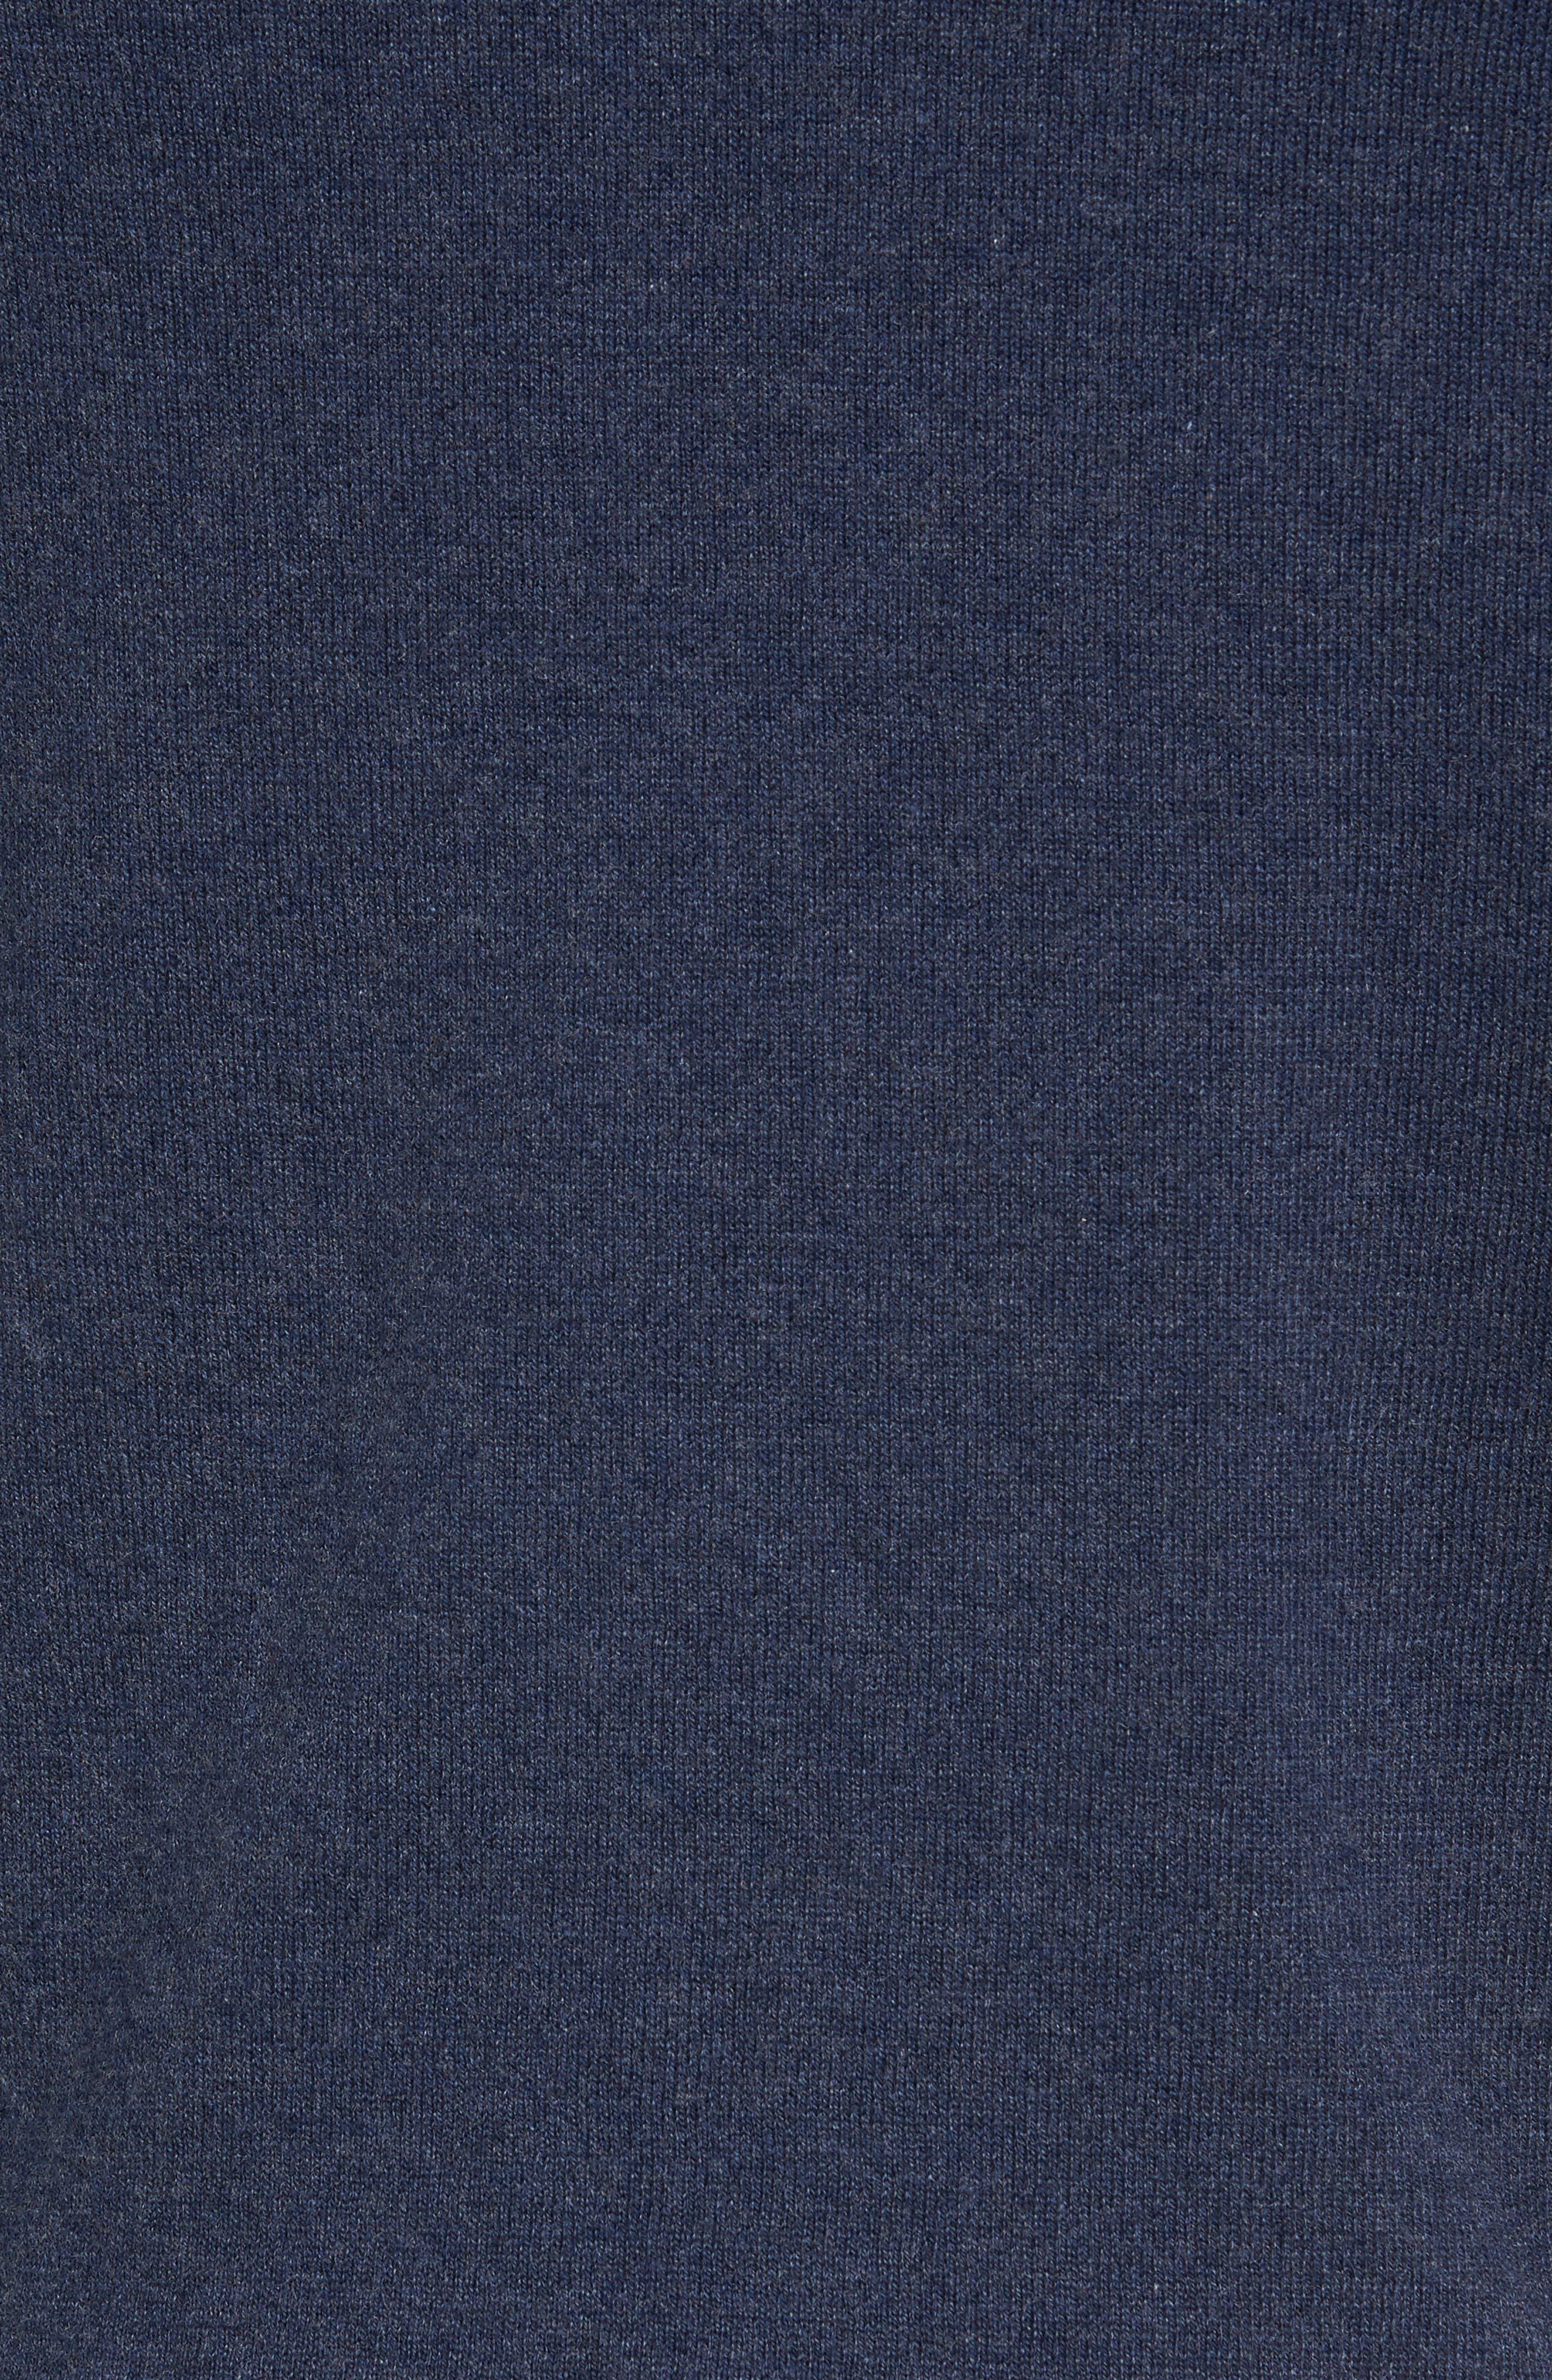 Men's Shop Shawl Collar Sweater,                             Alternate thumbnail 5, color,                             Blue Estate Heather